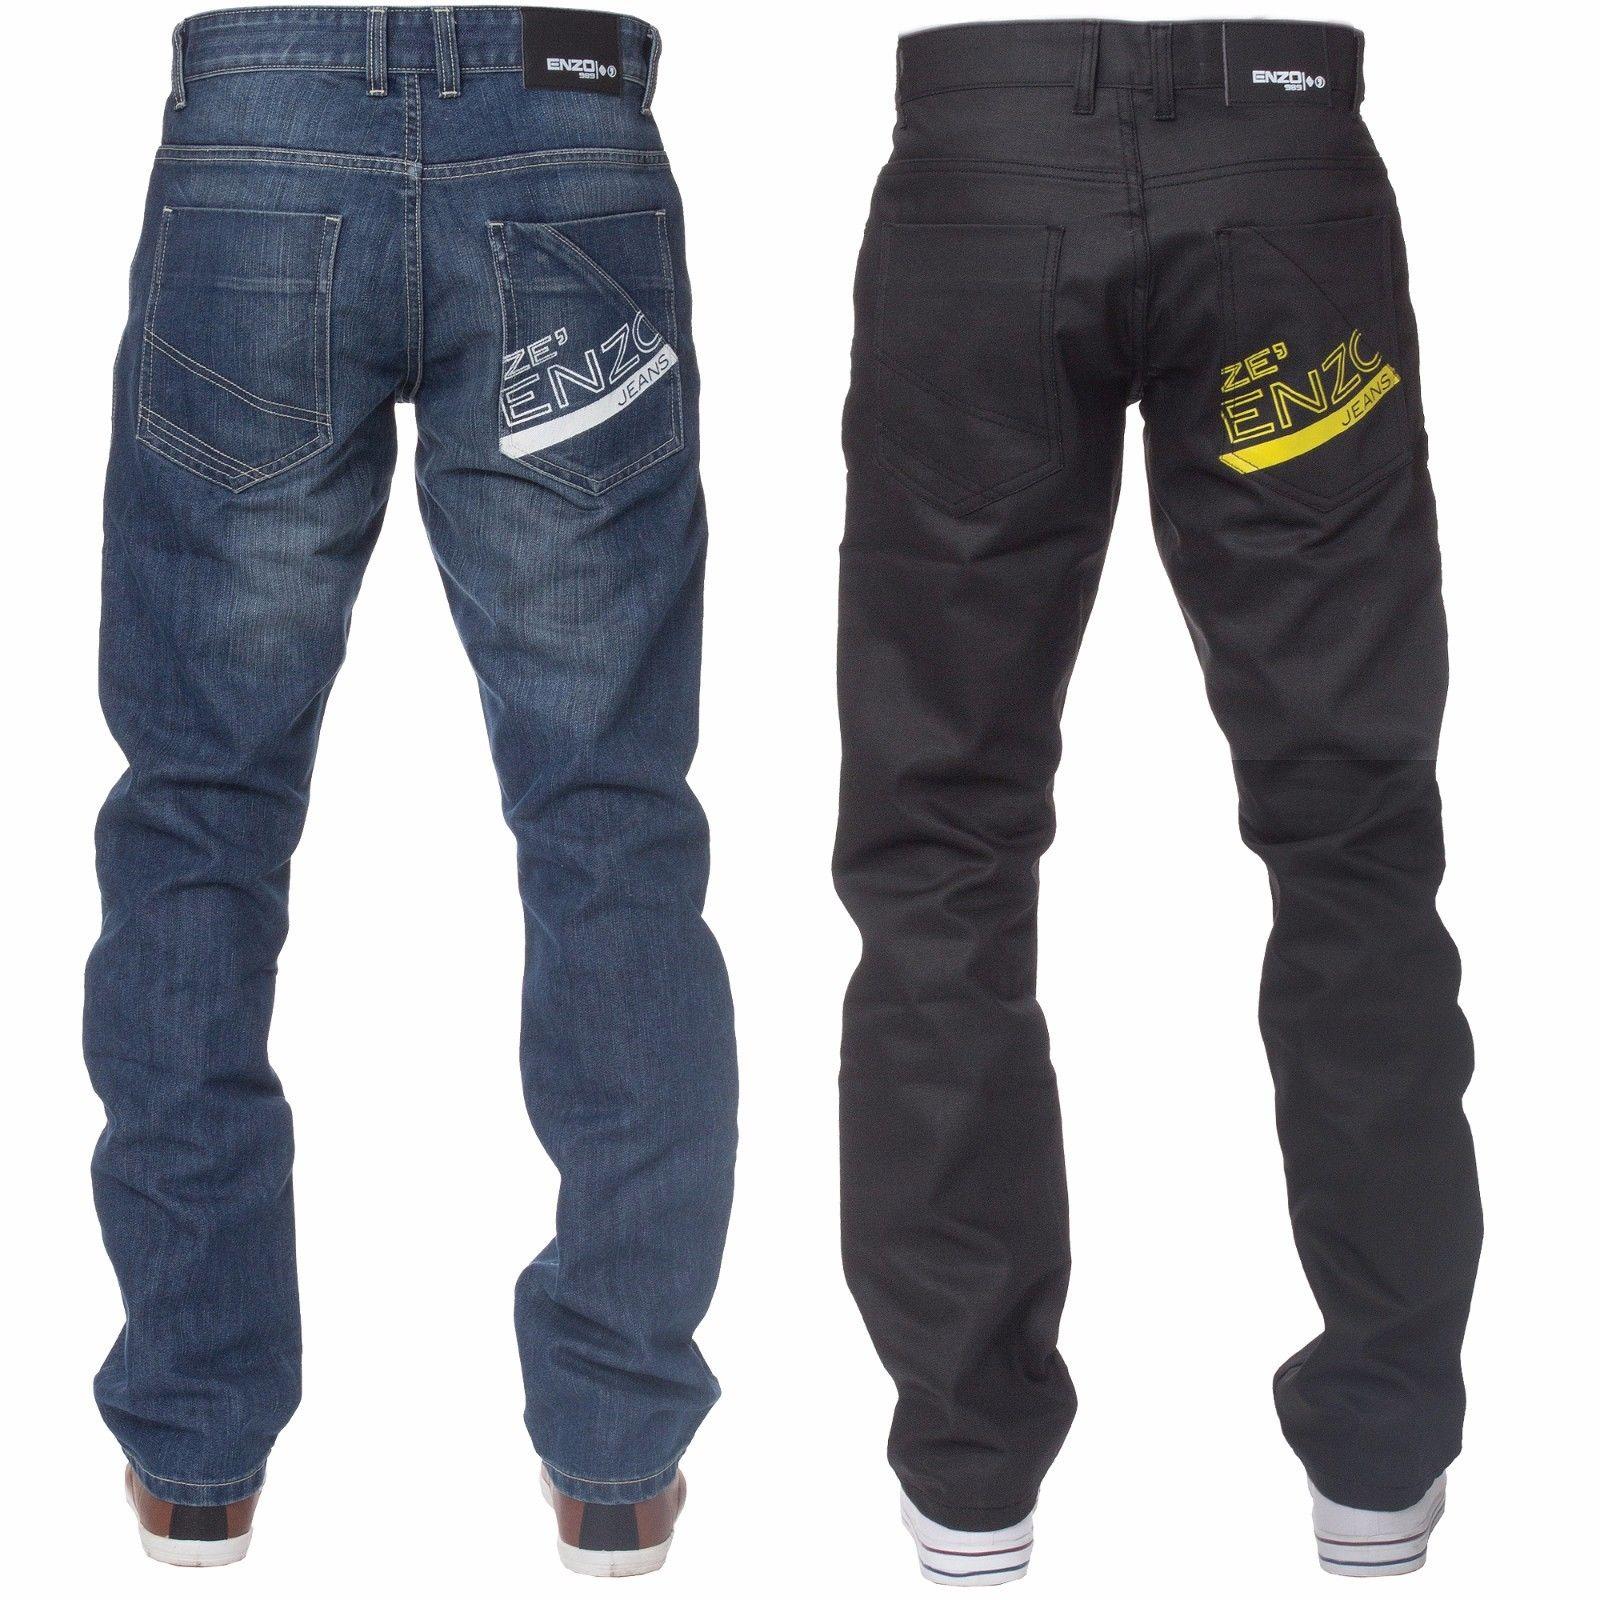 New straight fit mens black stonewash jeans £11.99 @ ebay / raw.denim - daily deals